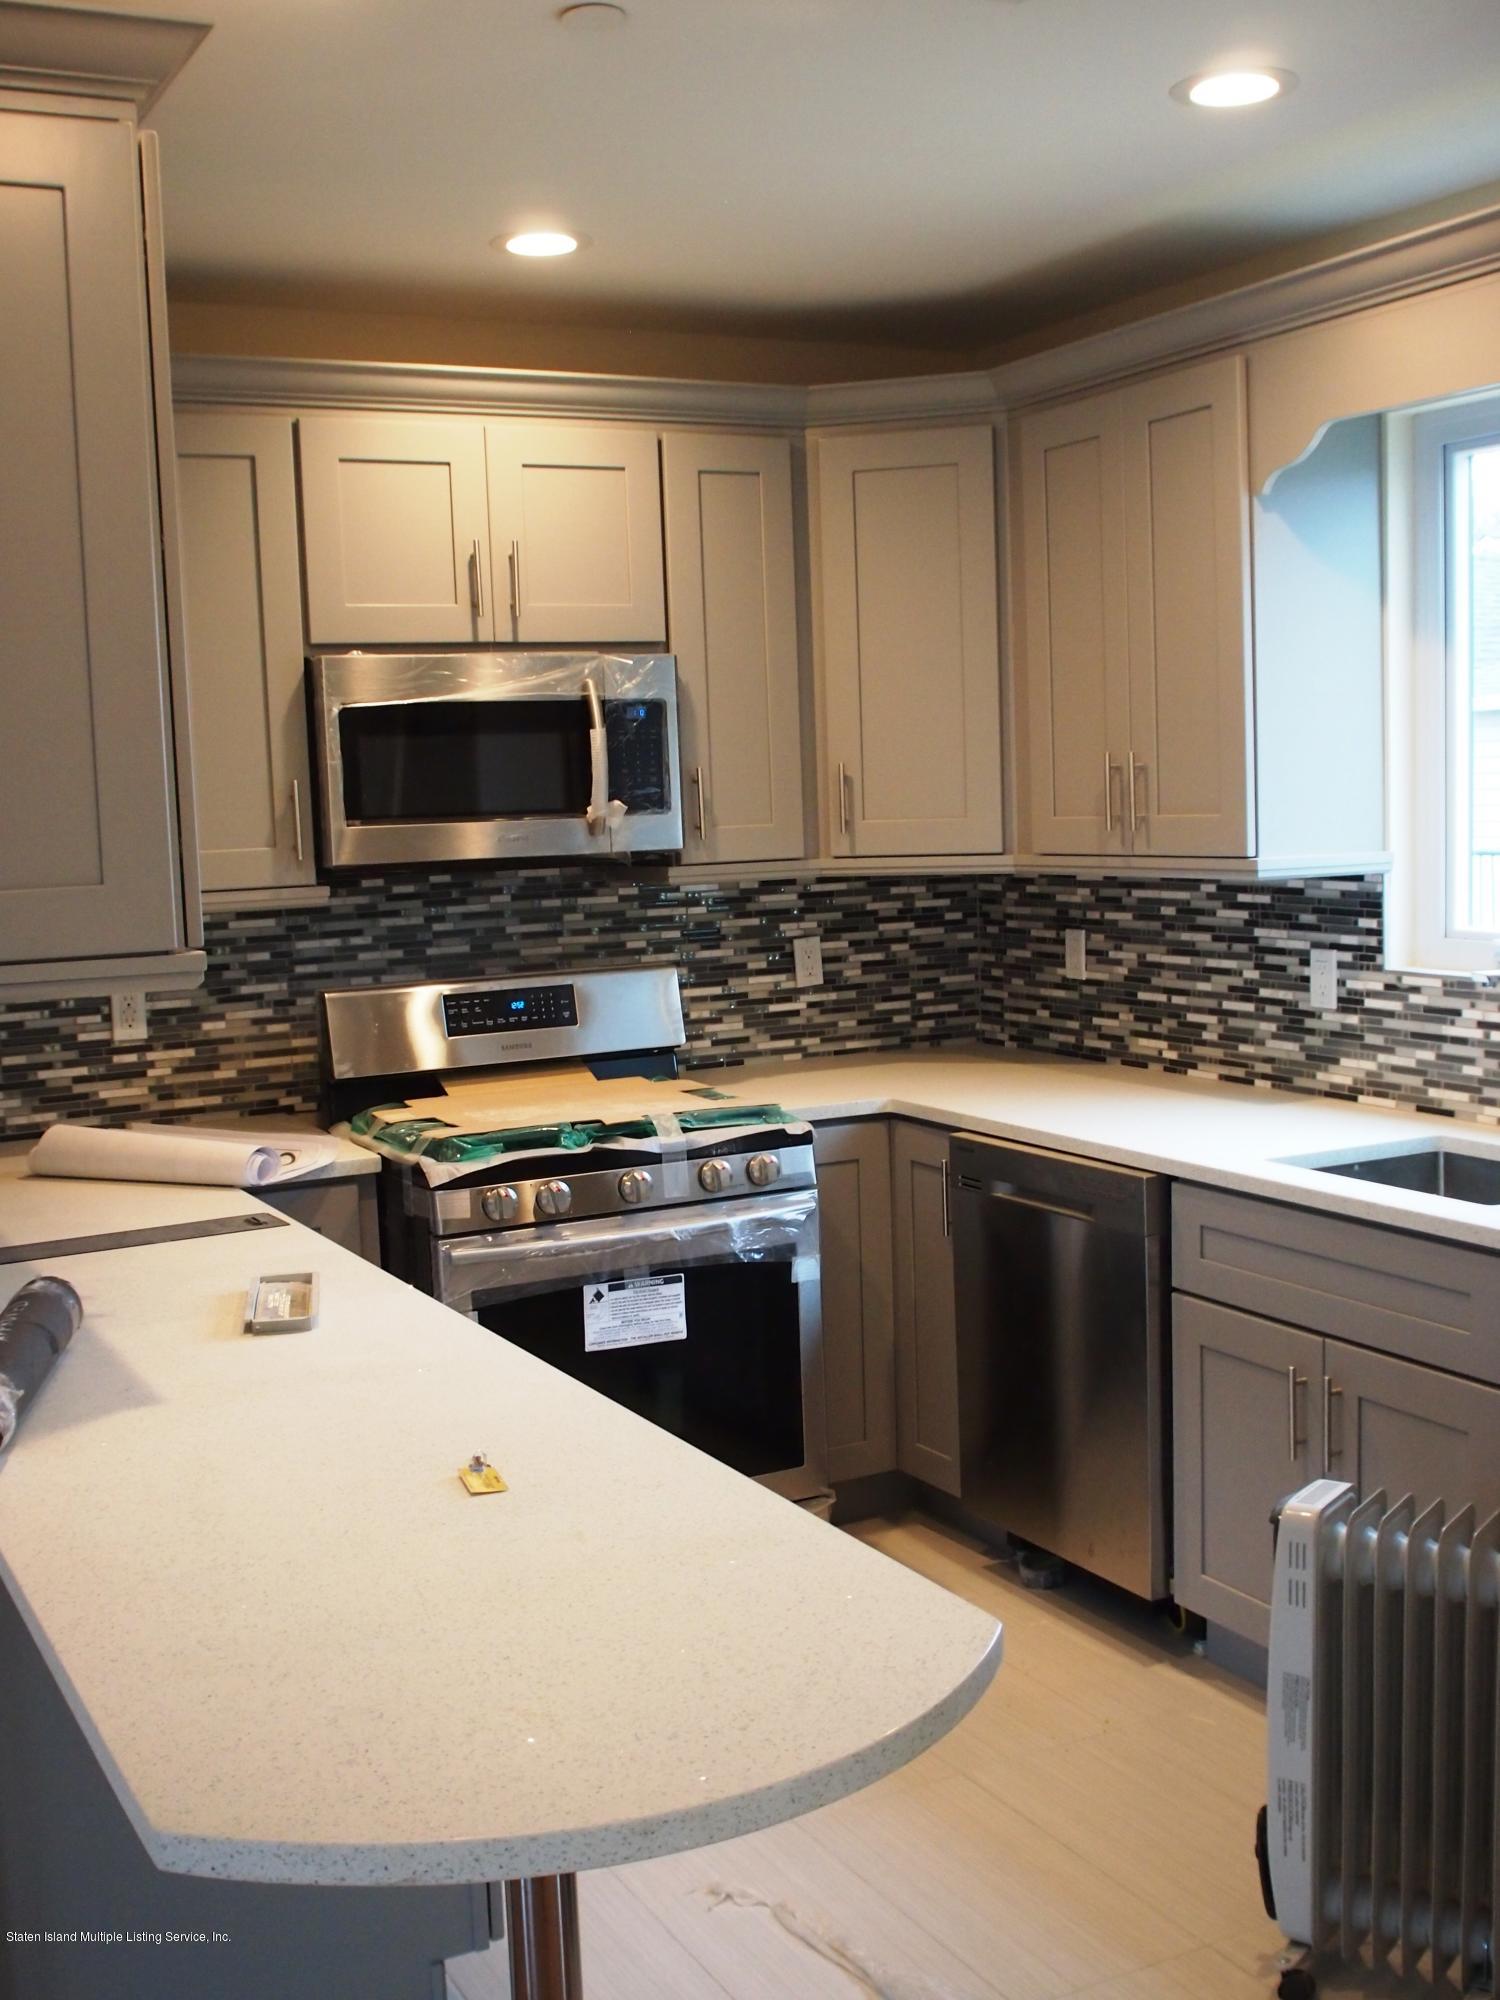 Single Family - Detached 22 Milbank Road  Staten Island, NY 10306, MLS-1113414-5